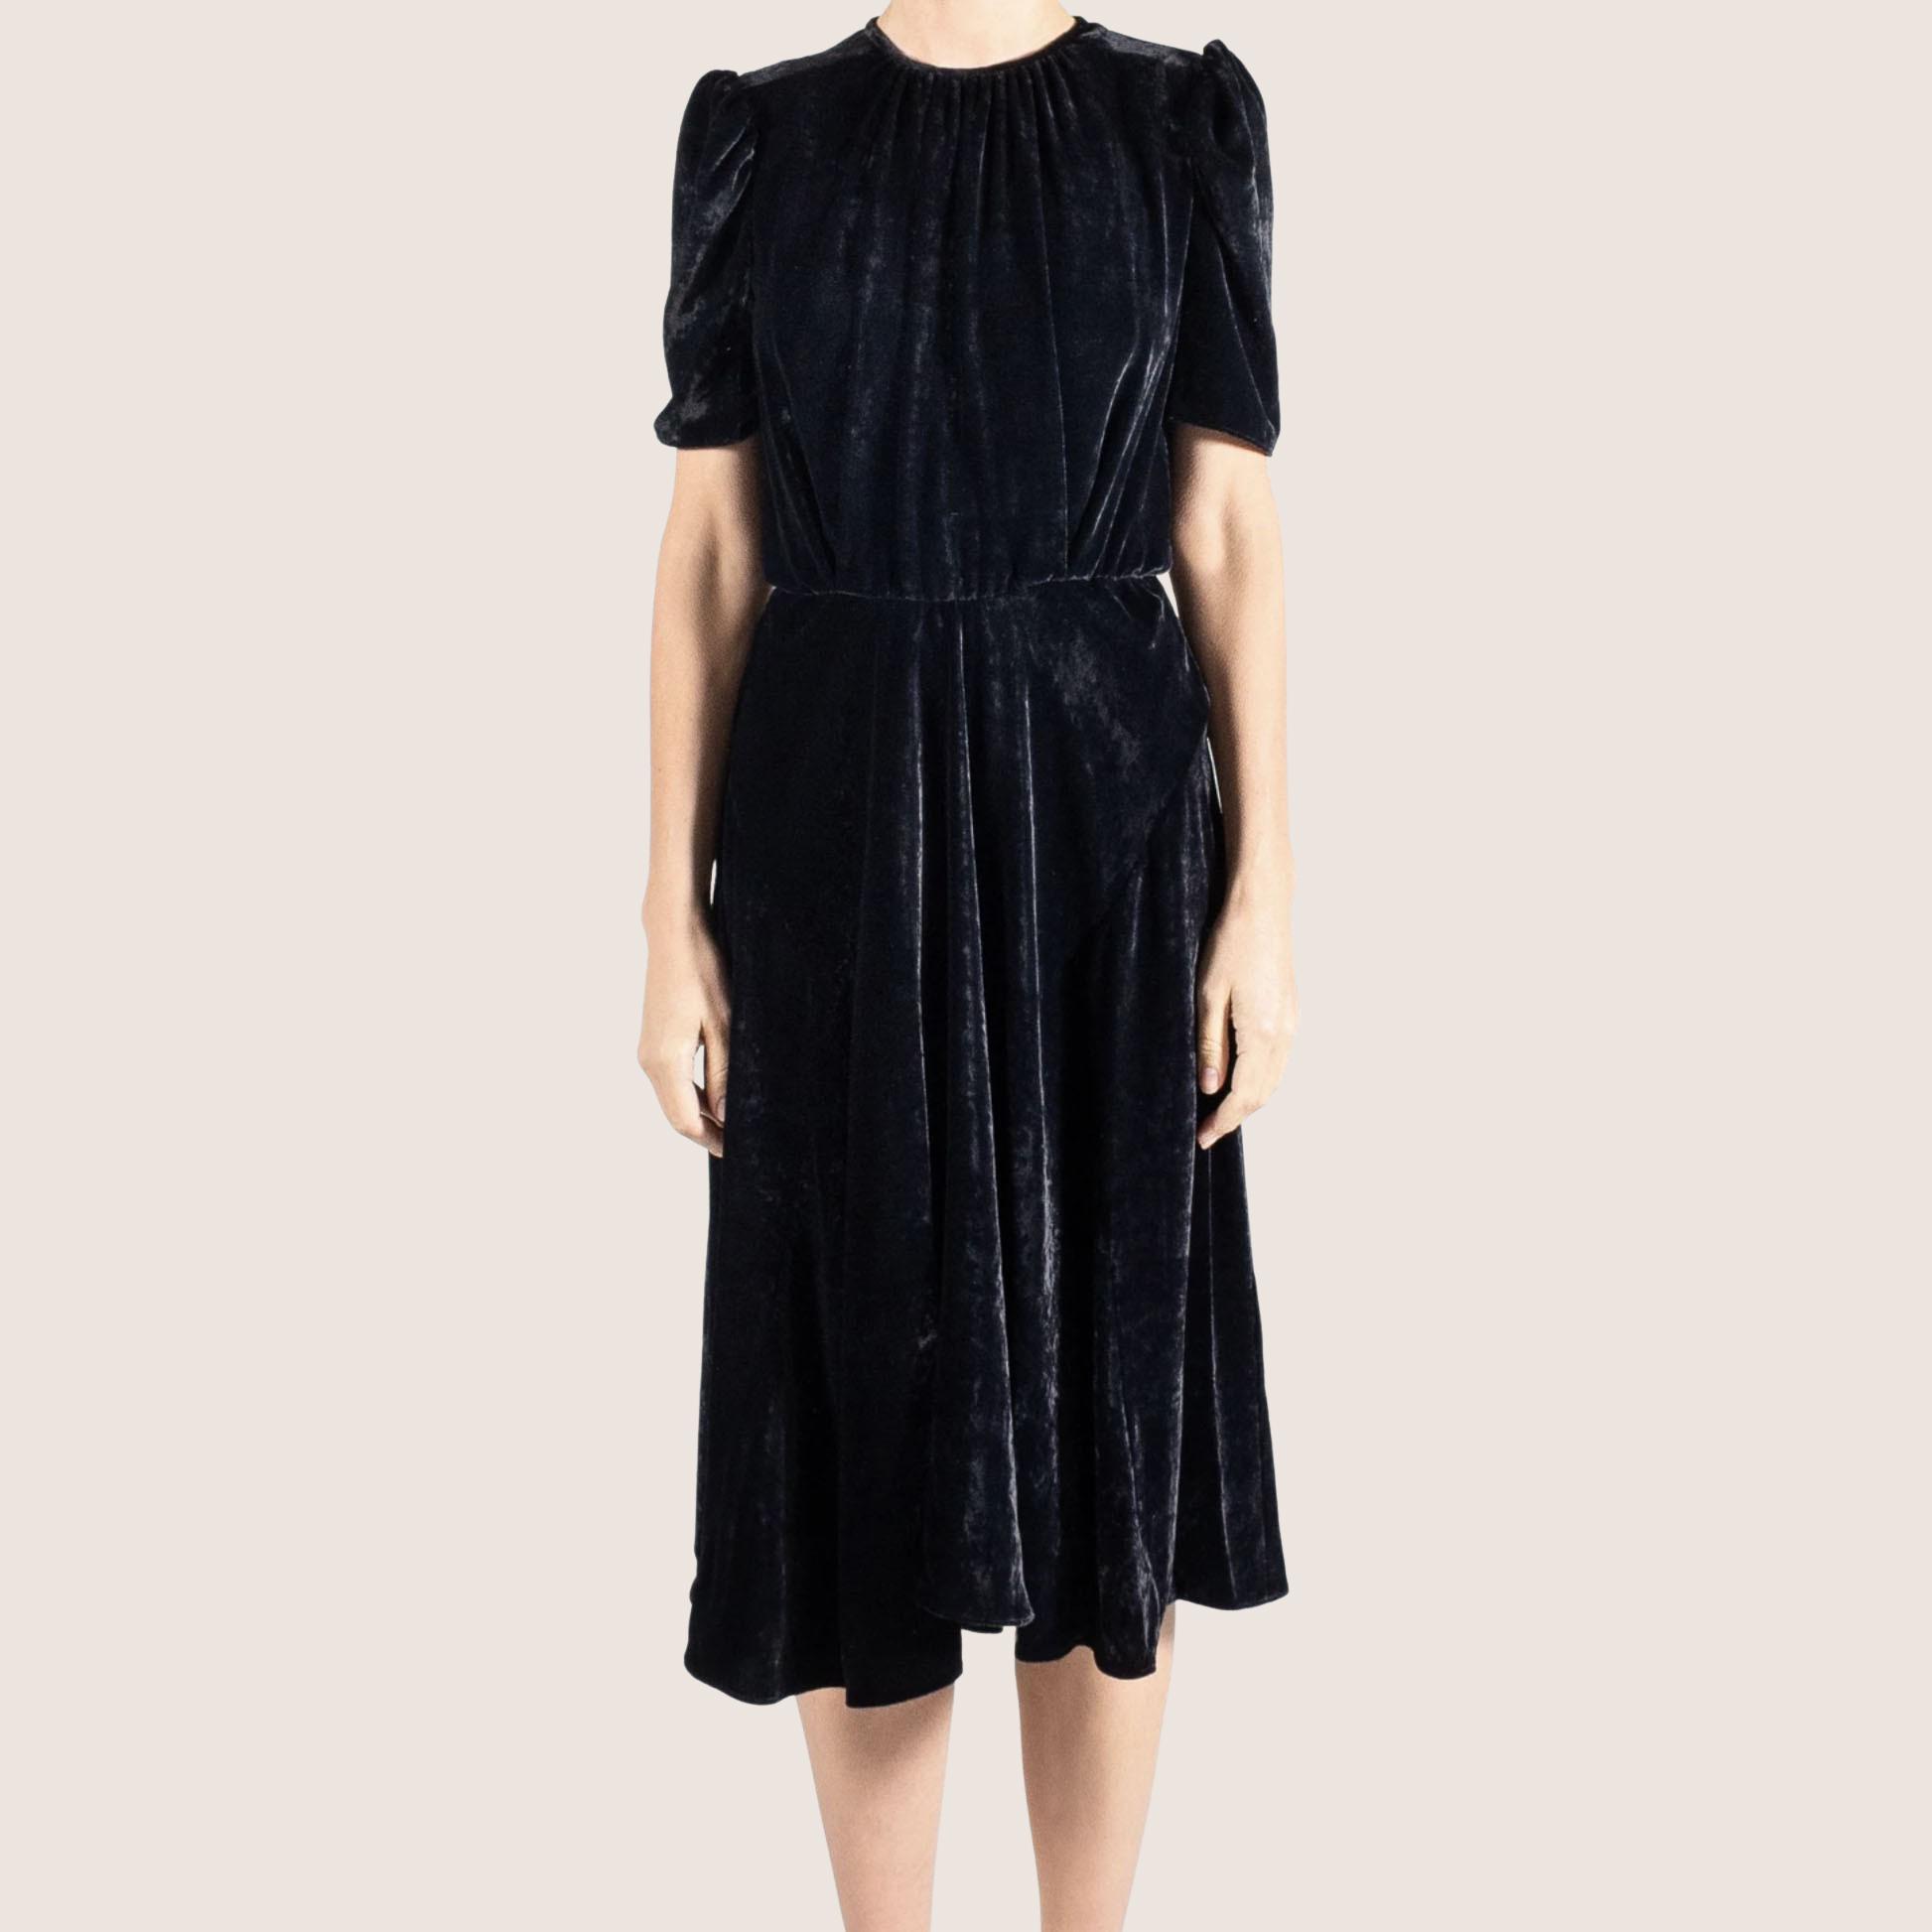 Uliana Dress